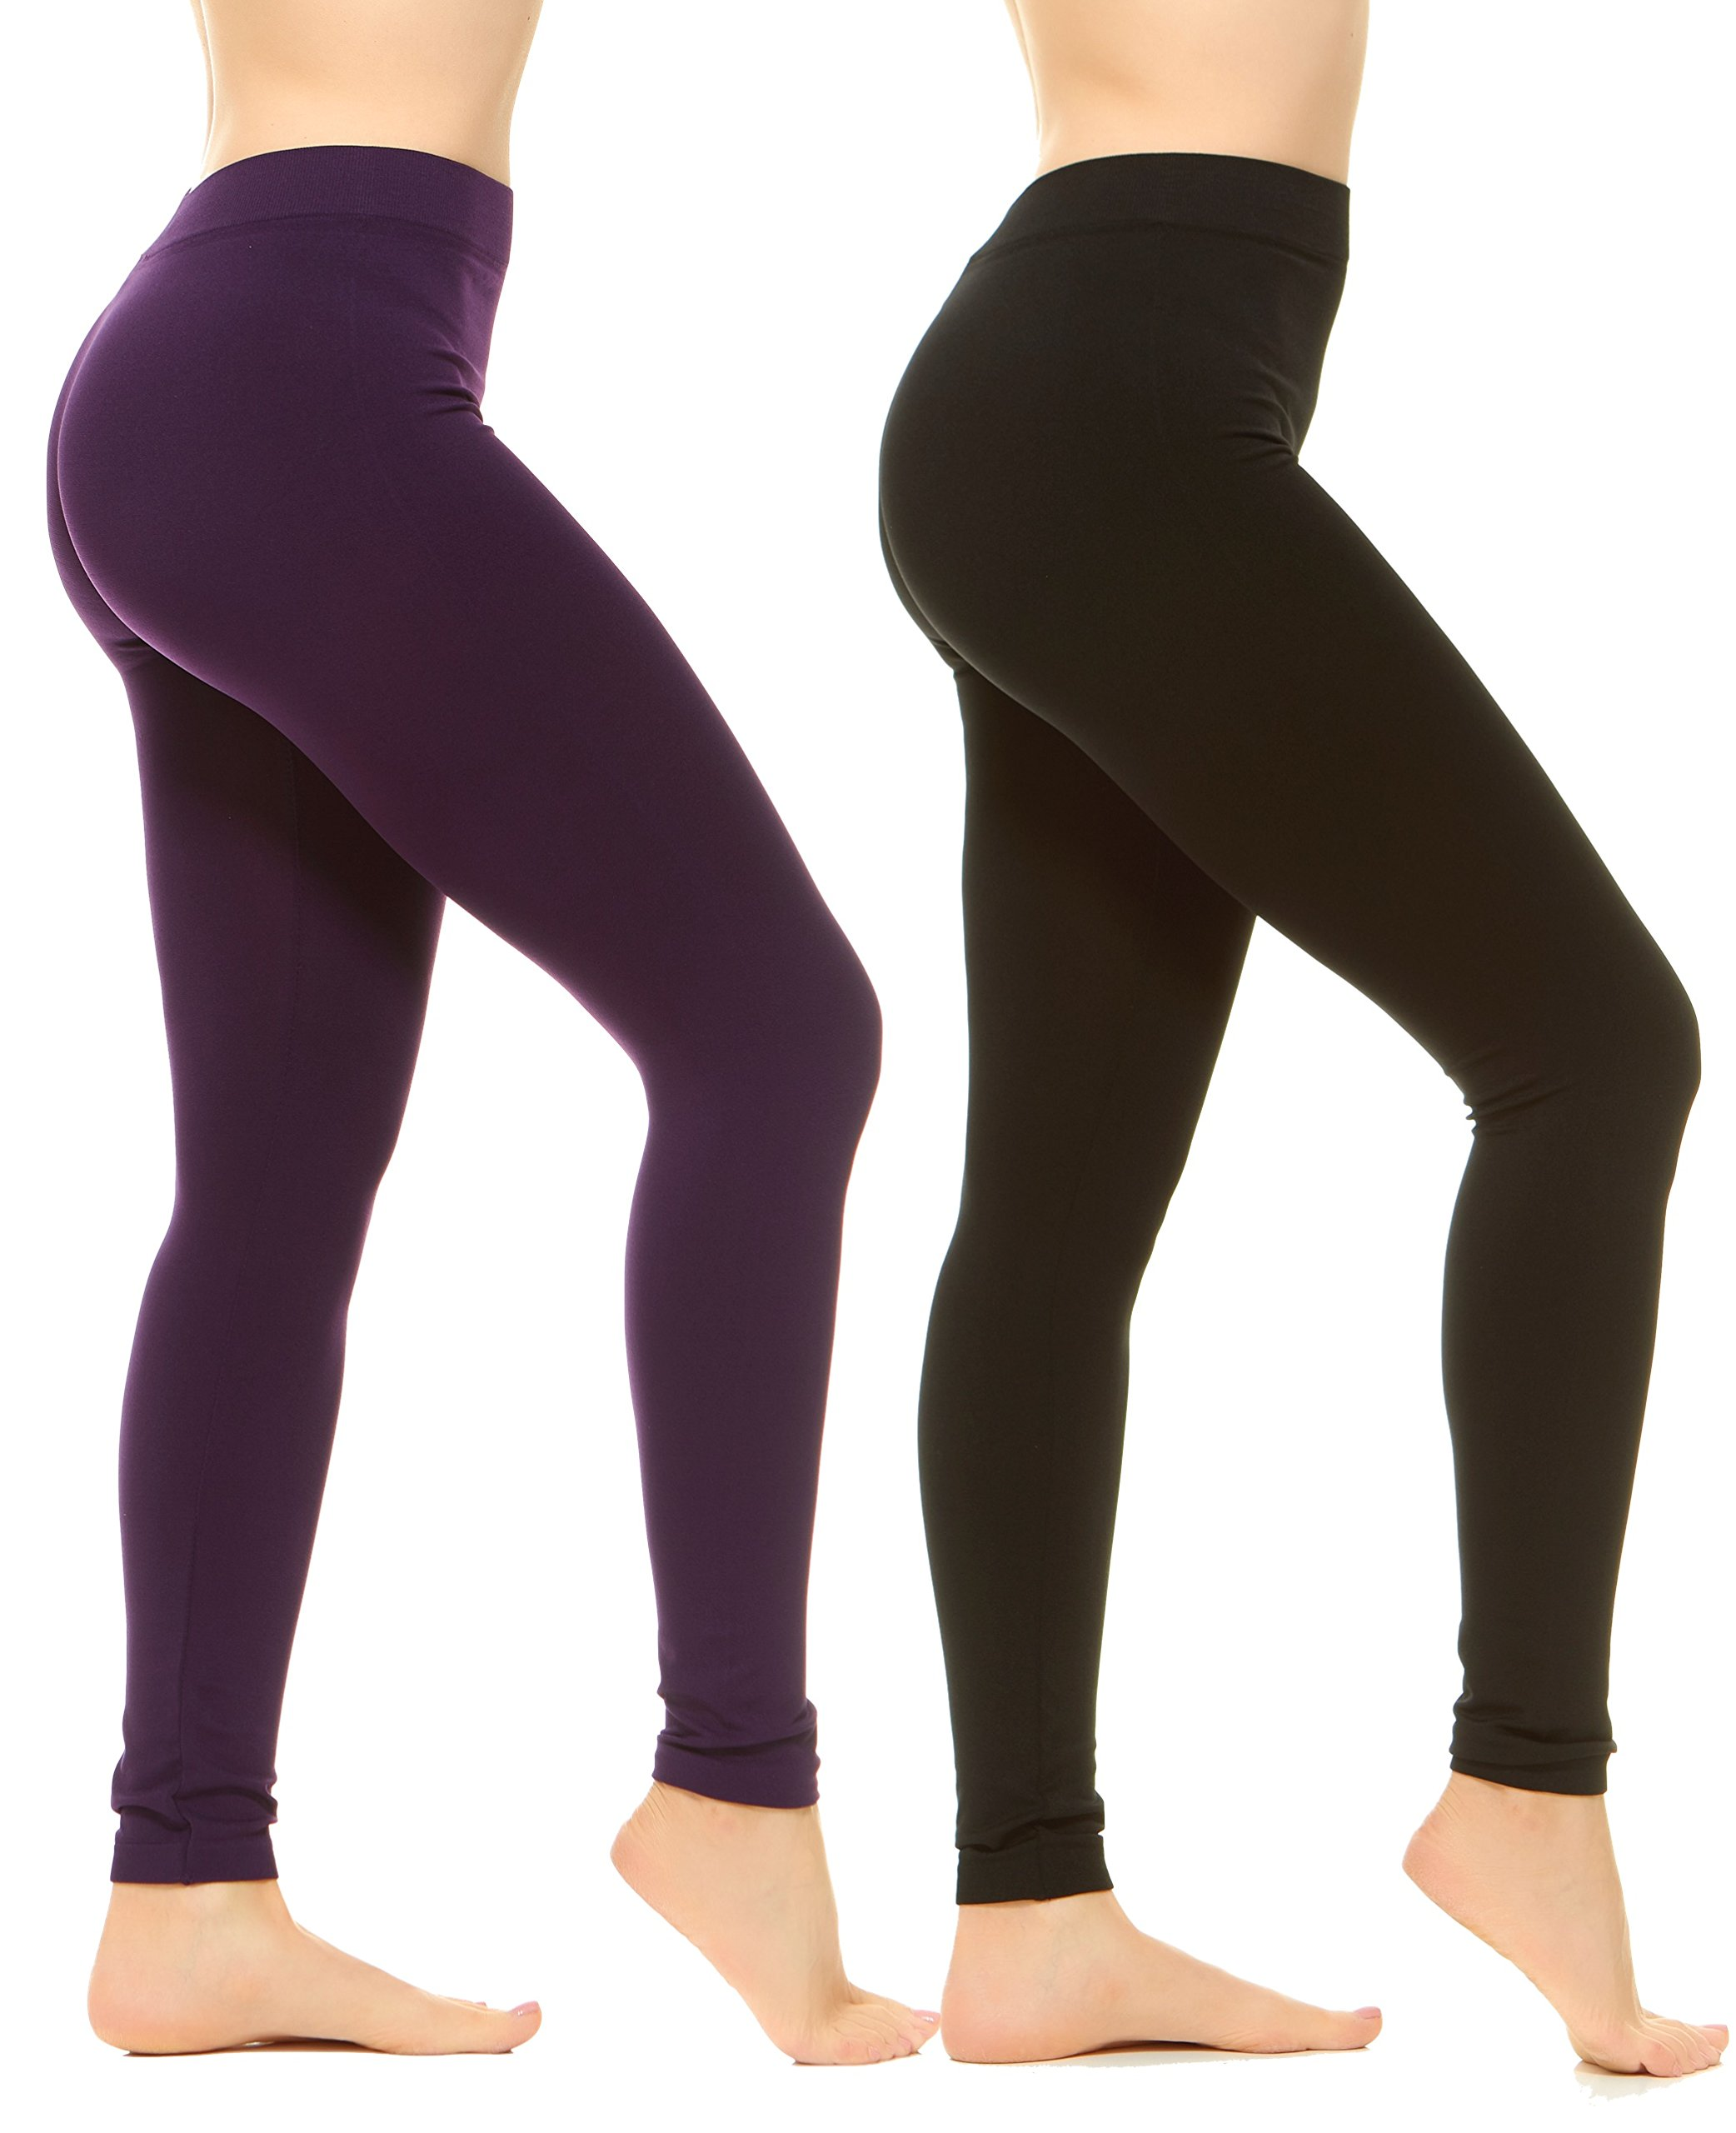 Unique Styles High Waist Leggings for Women Soft Yoga Pants Ribbed Waistband (Plus Size, 2-PK: Black, Purple)